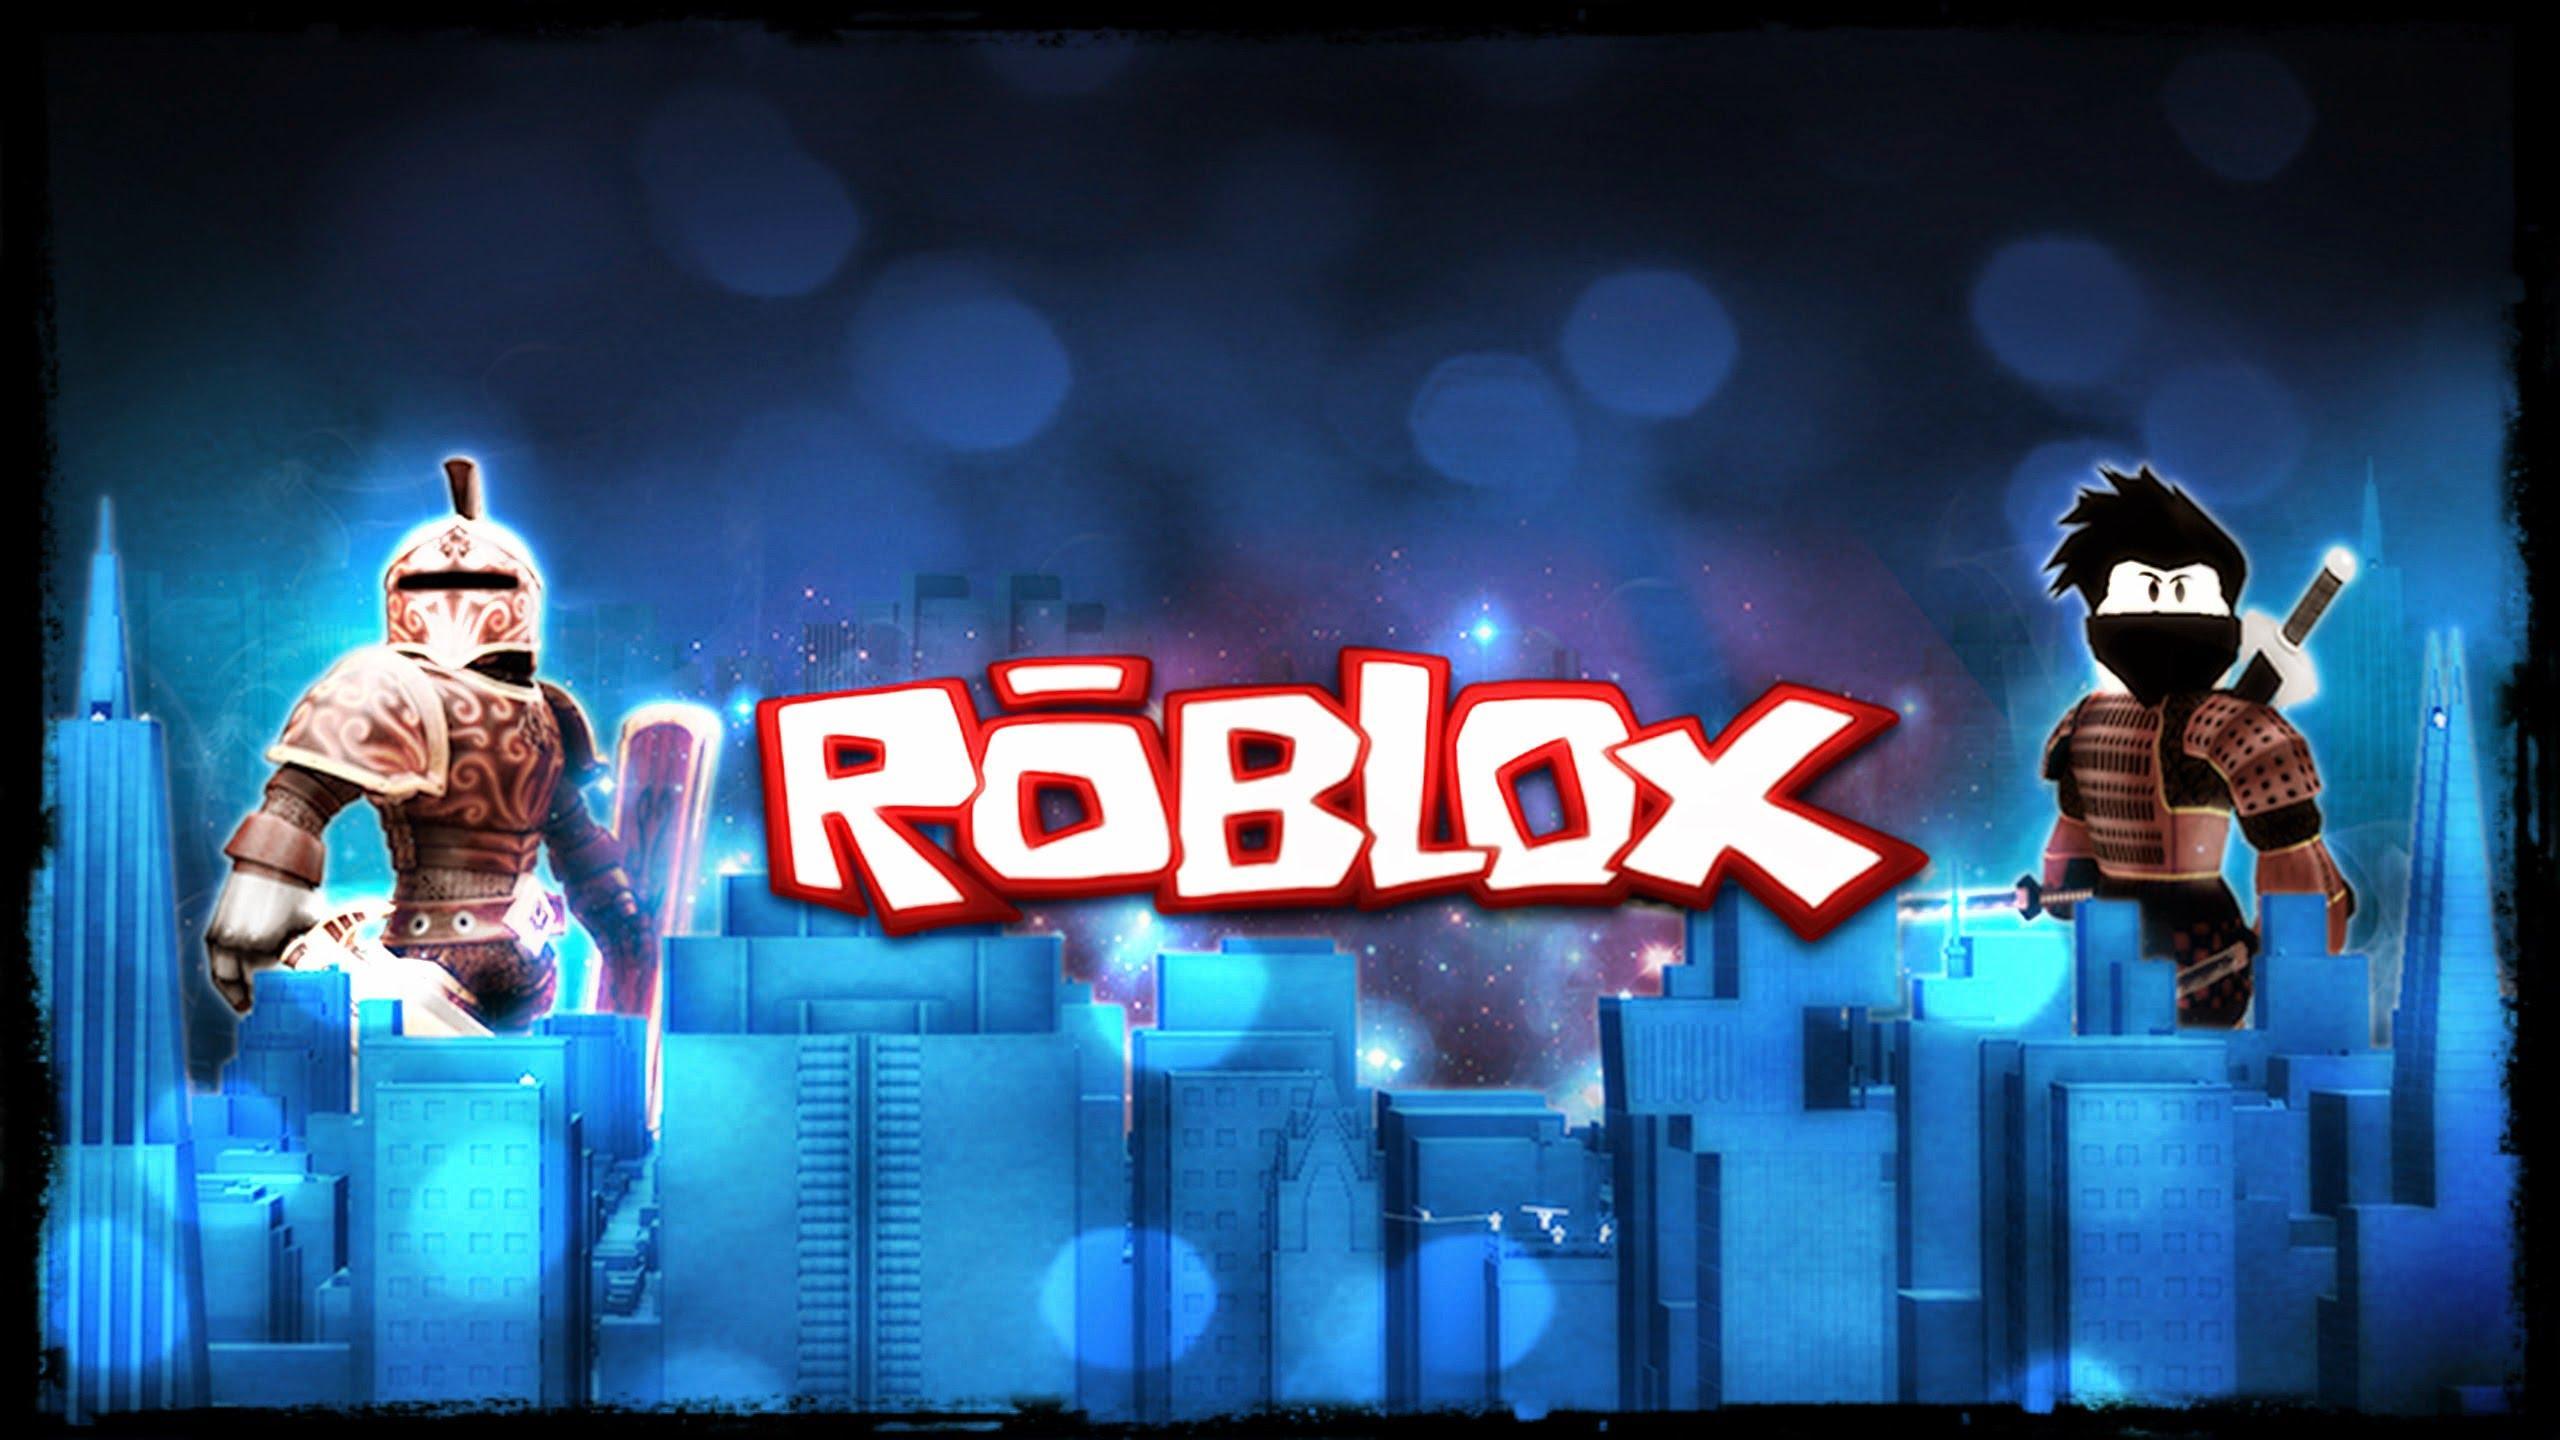 Exceptional Hexagon Bathroom Tile #5 - Roblox YouTube Backround .